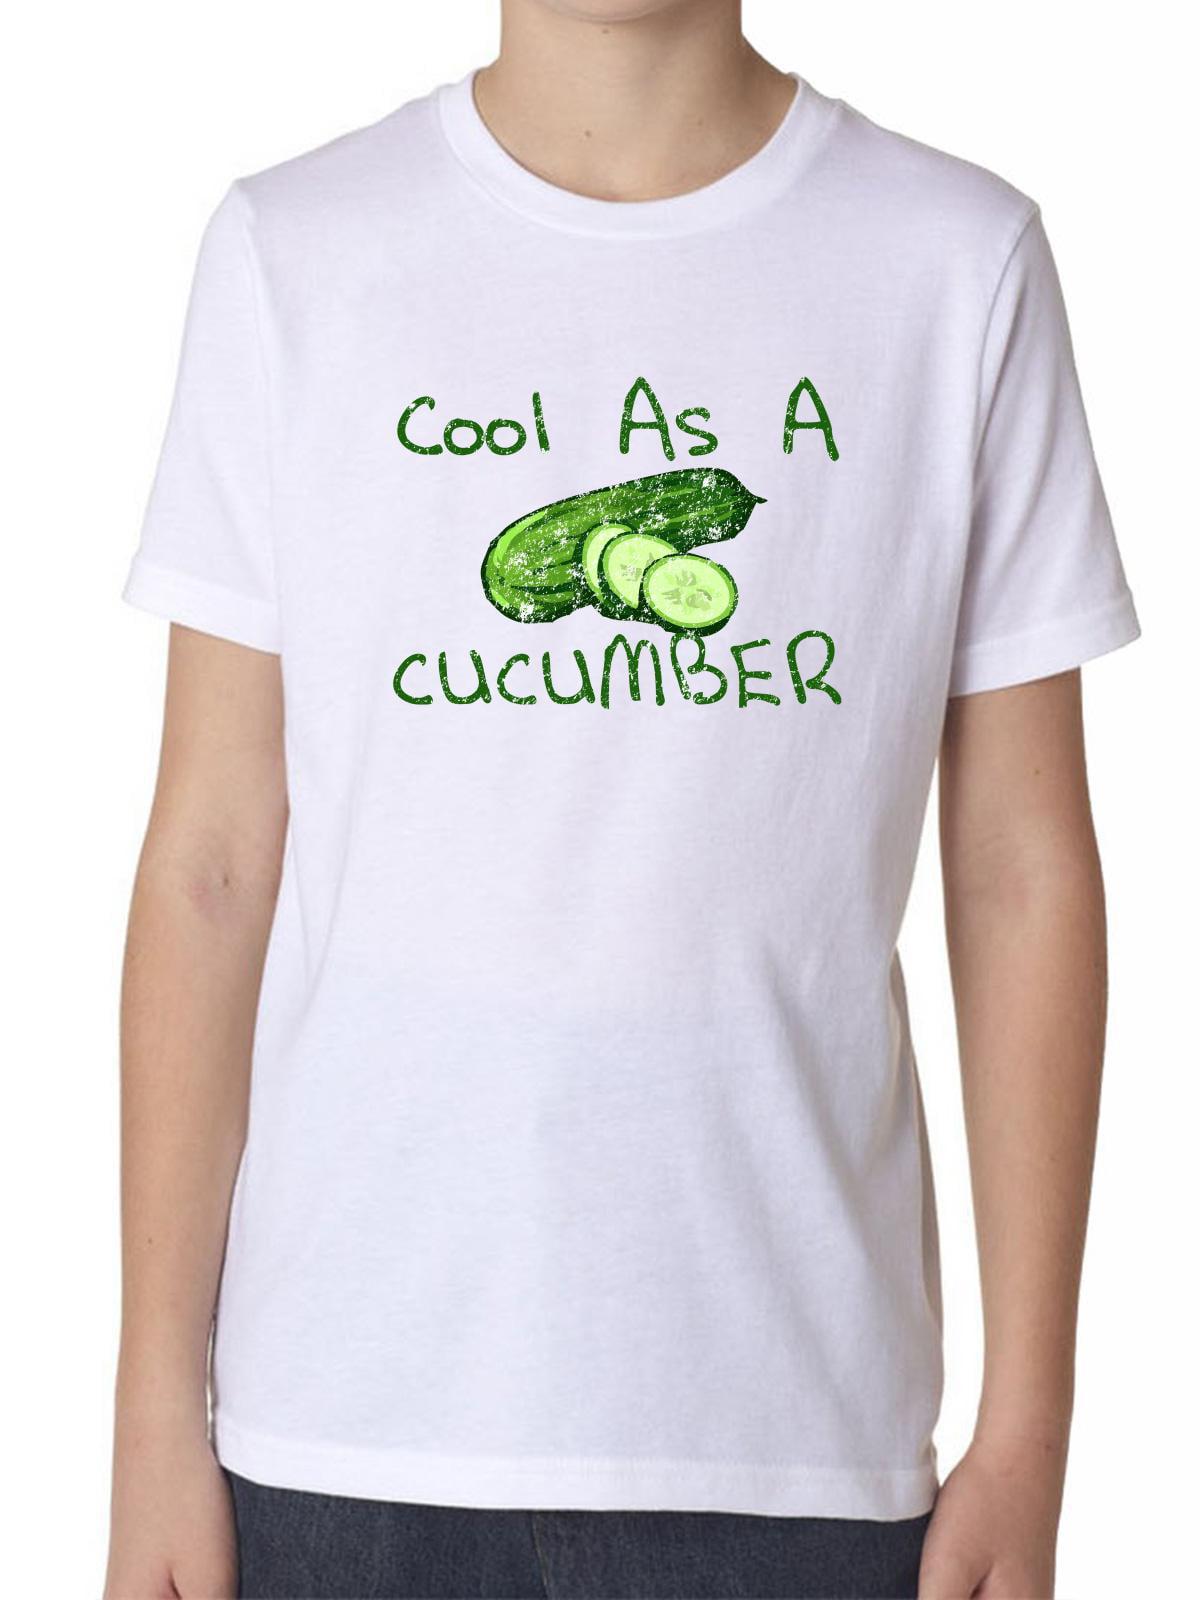 8d826226 Hollywood Thread - Cool As A Cucumber - Green Vegetable Love Boy's Cotton  Youth T-Shirt - Walmart.com